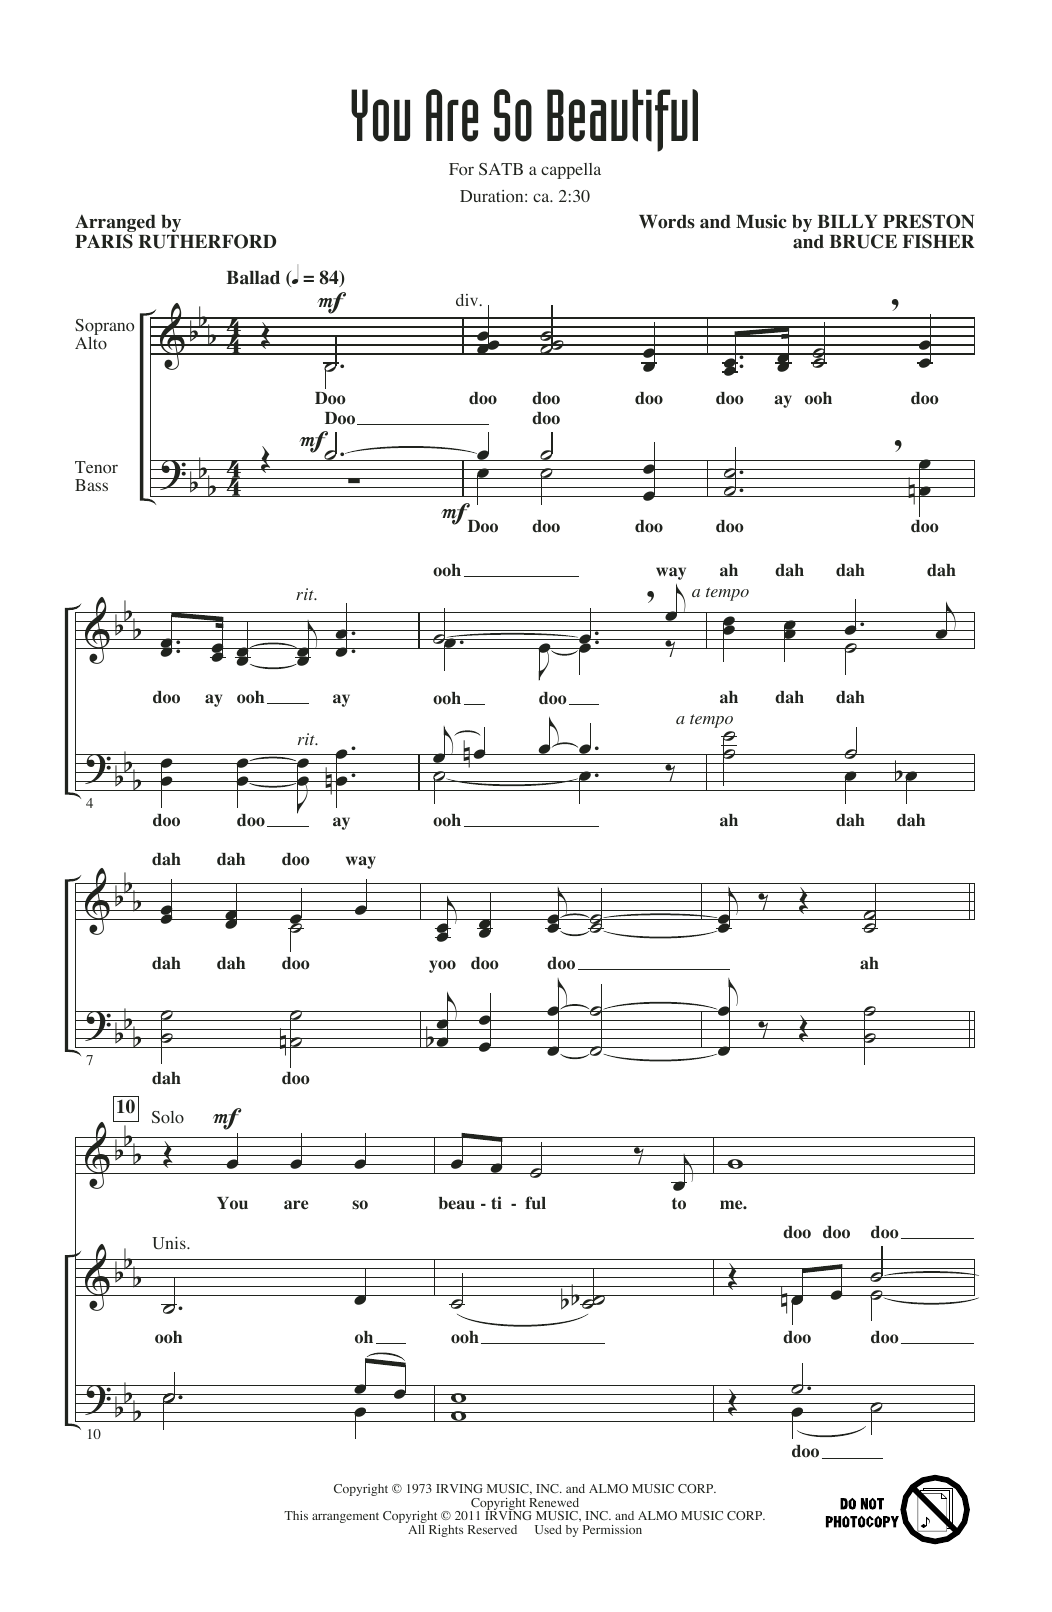 You Are So Beautiful (arr. Paris Rutherford) (SATB Choir)